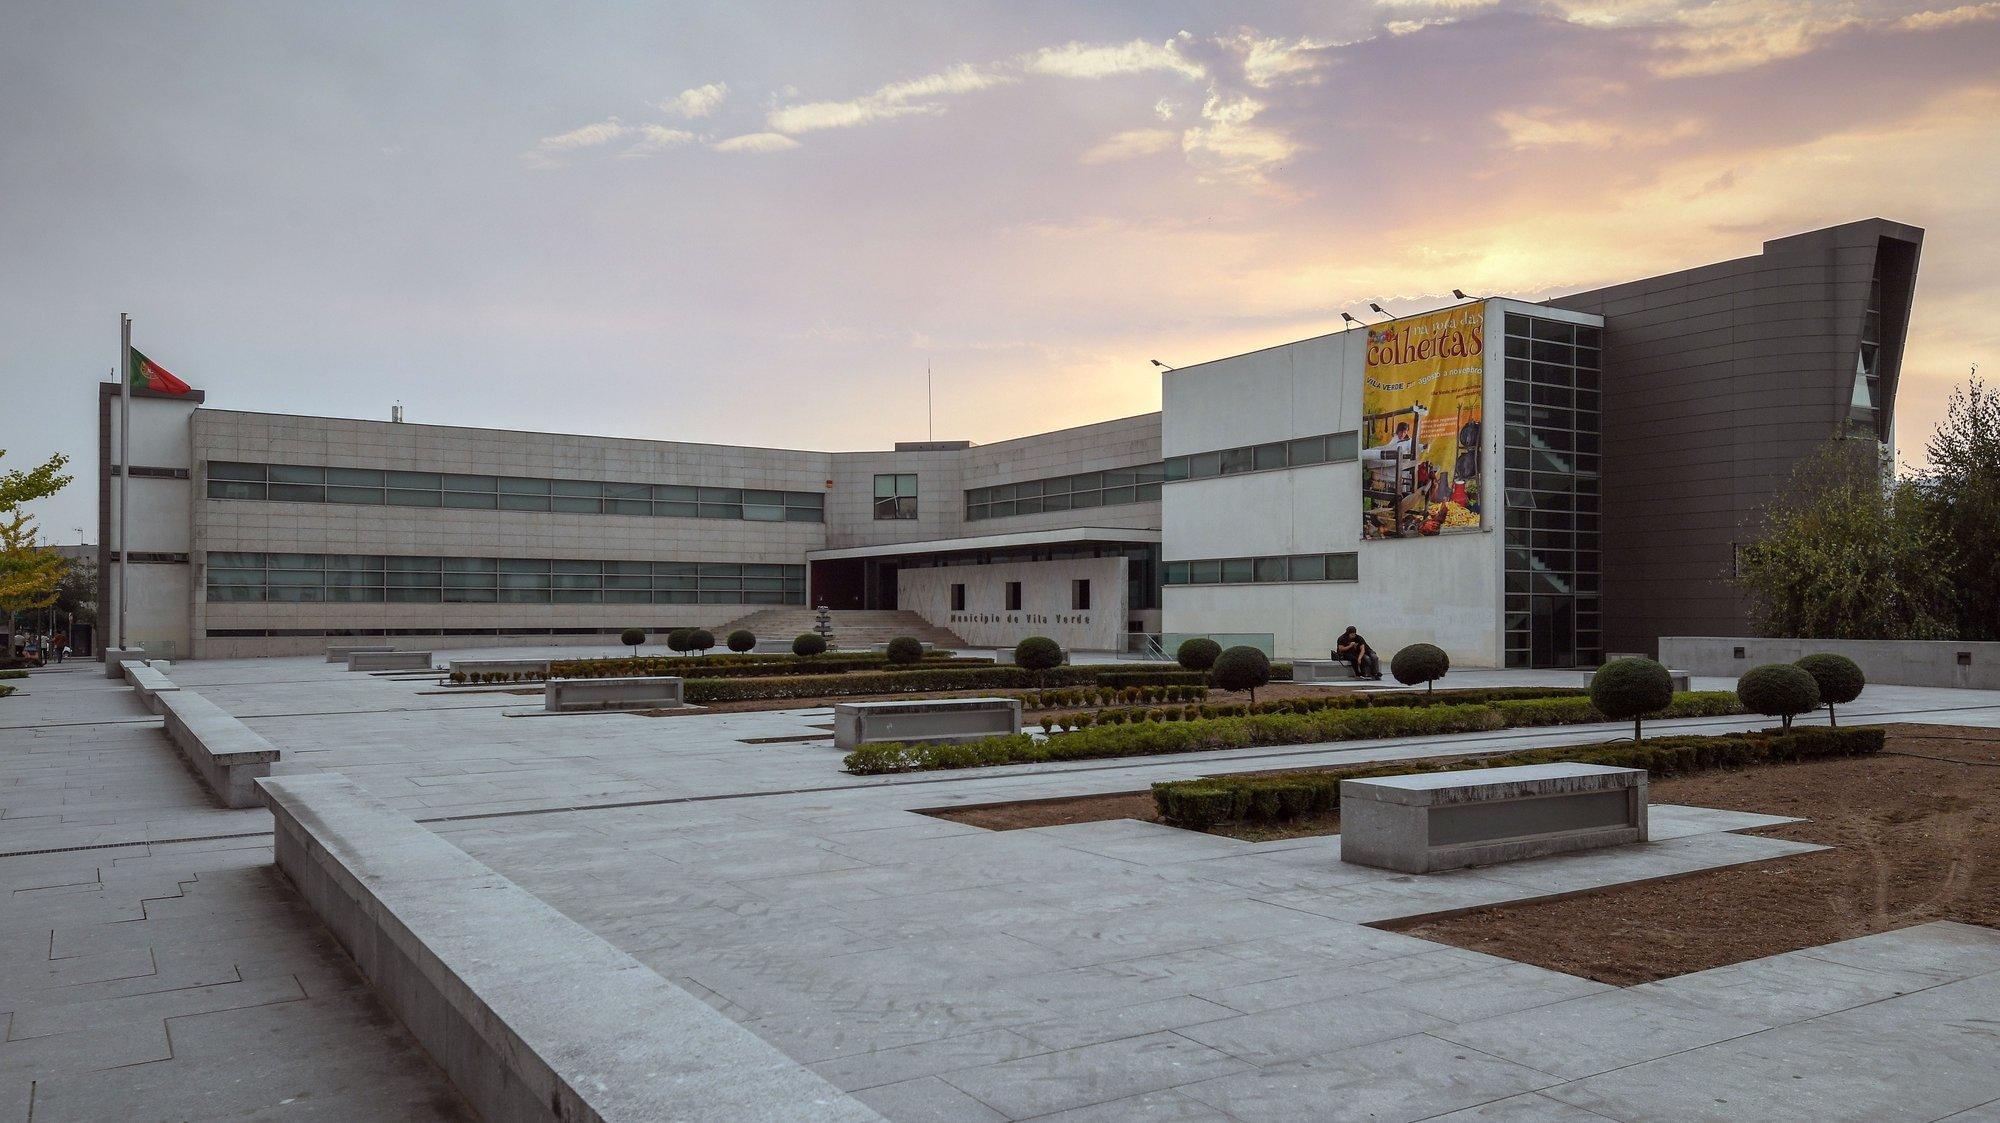 Edifício da Câmara Municipal de Vila Verde, 15 de outubro de 2017. HUGO DELGADO/LUSA